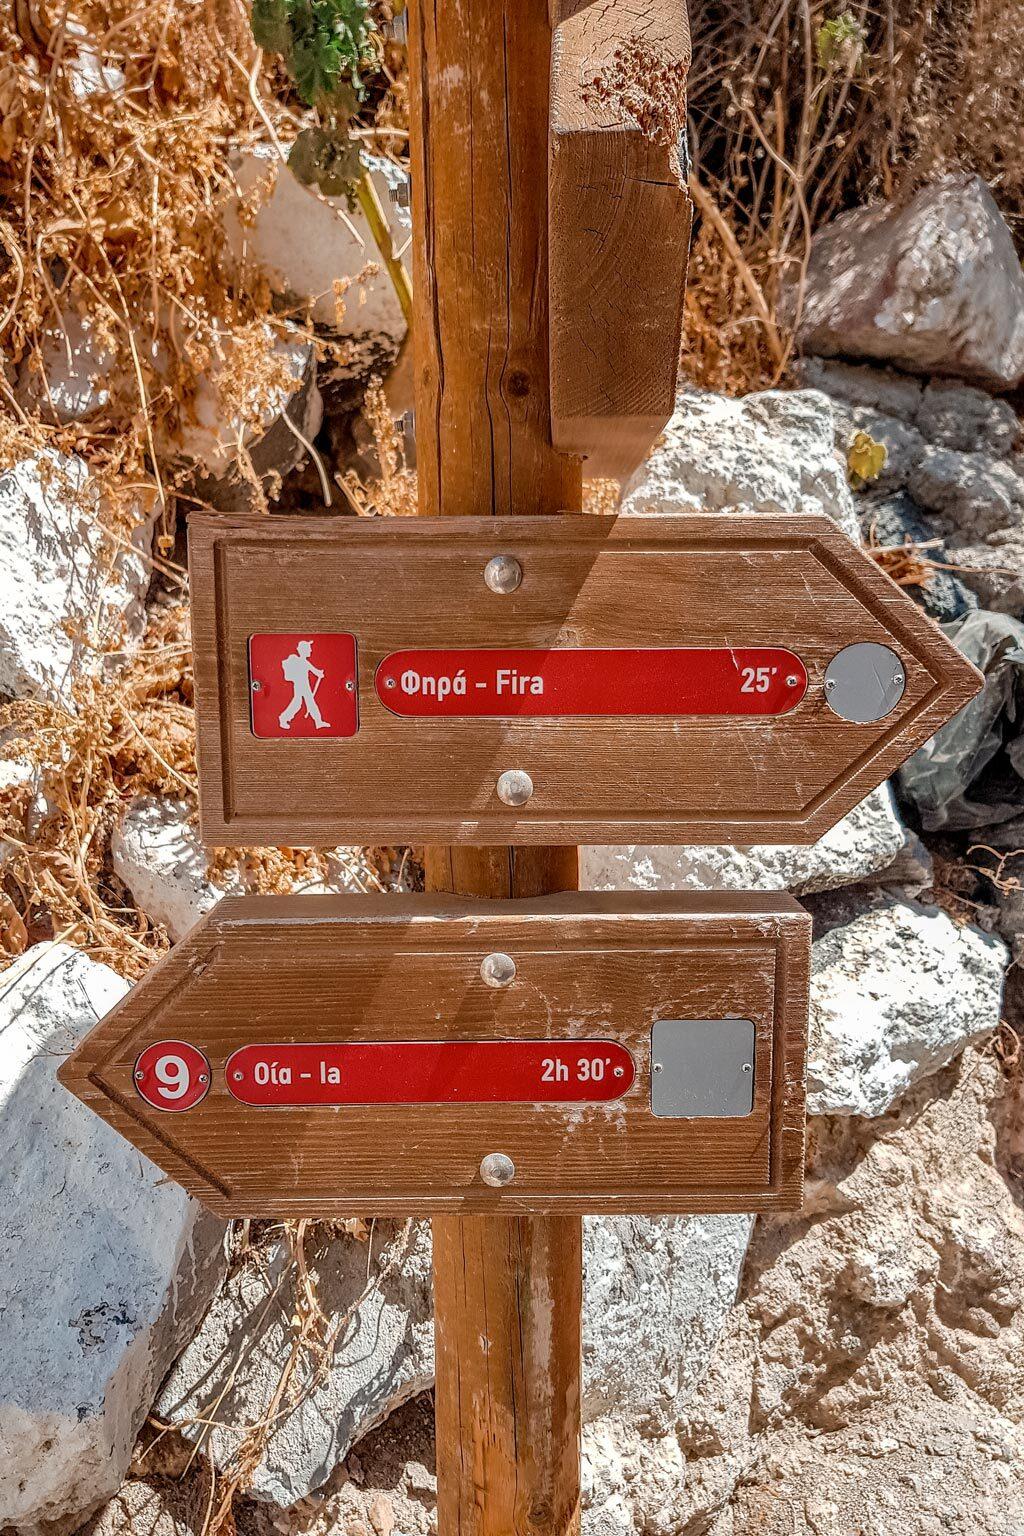 Hiking Signpost Oia to Fira